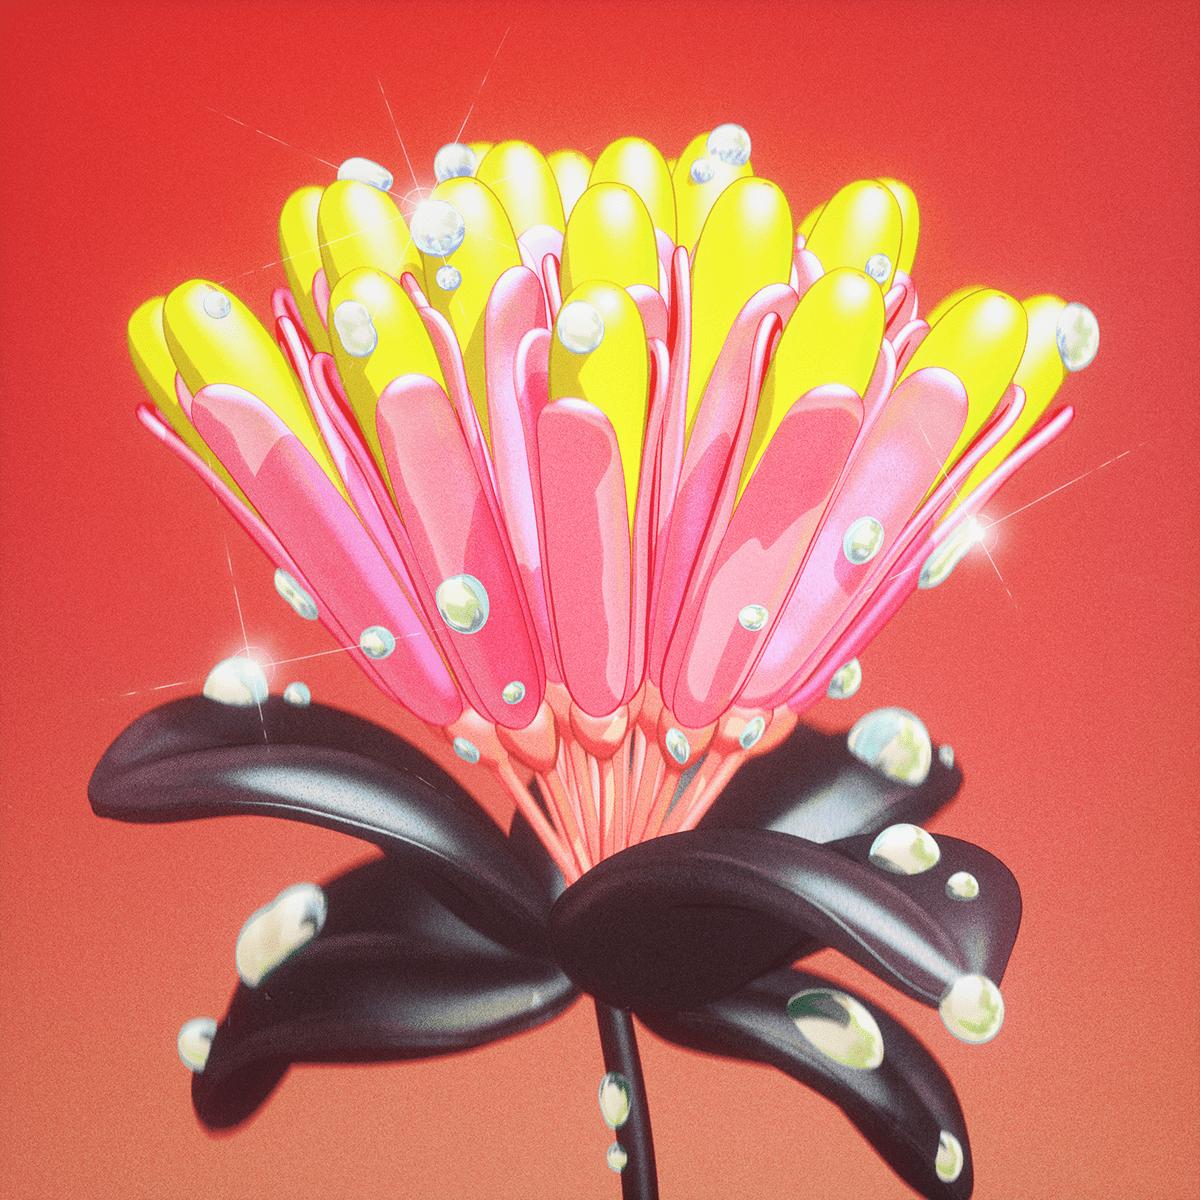 3d art Character coloful concept art Digital Art  flower motion graphics  toy design